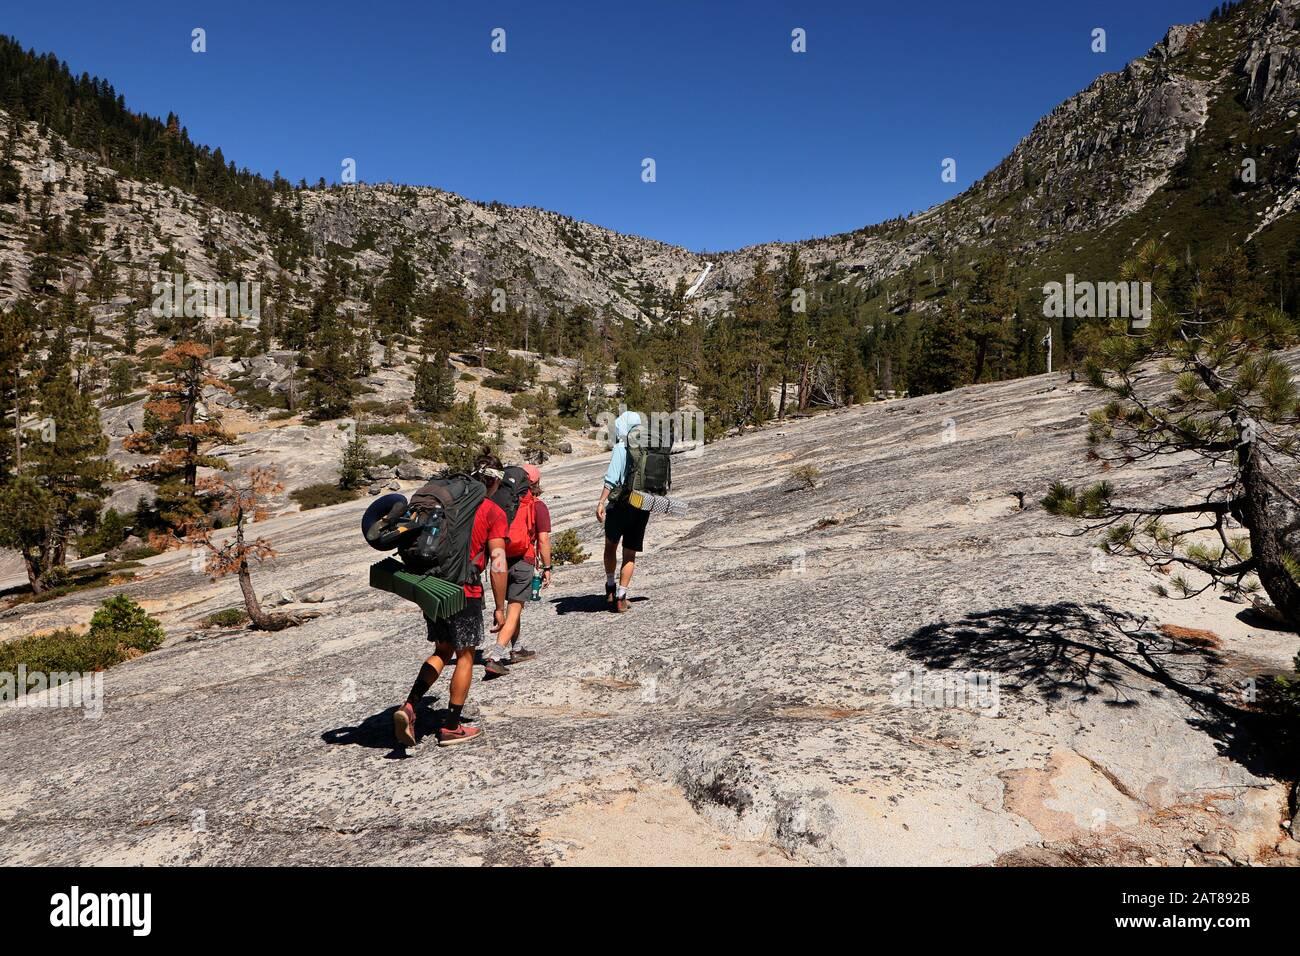 Pyramid Peak Trail Glacial valley Eldorado National Forest California Stock Photo